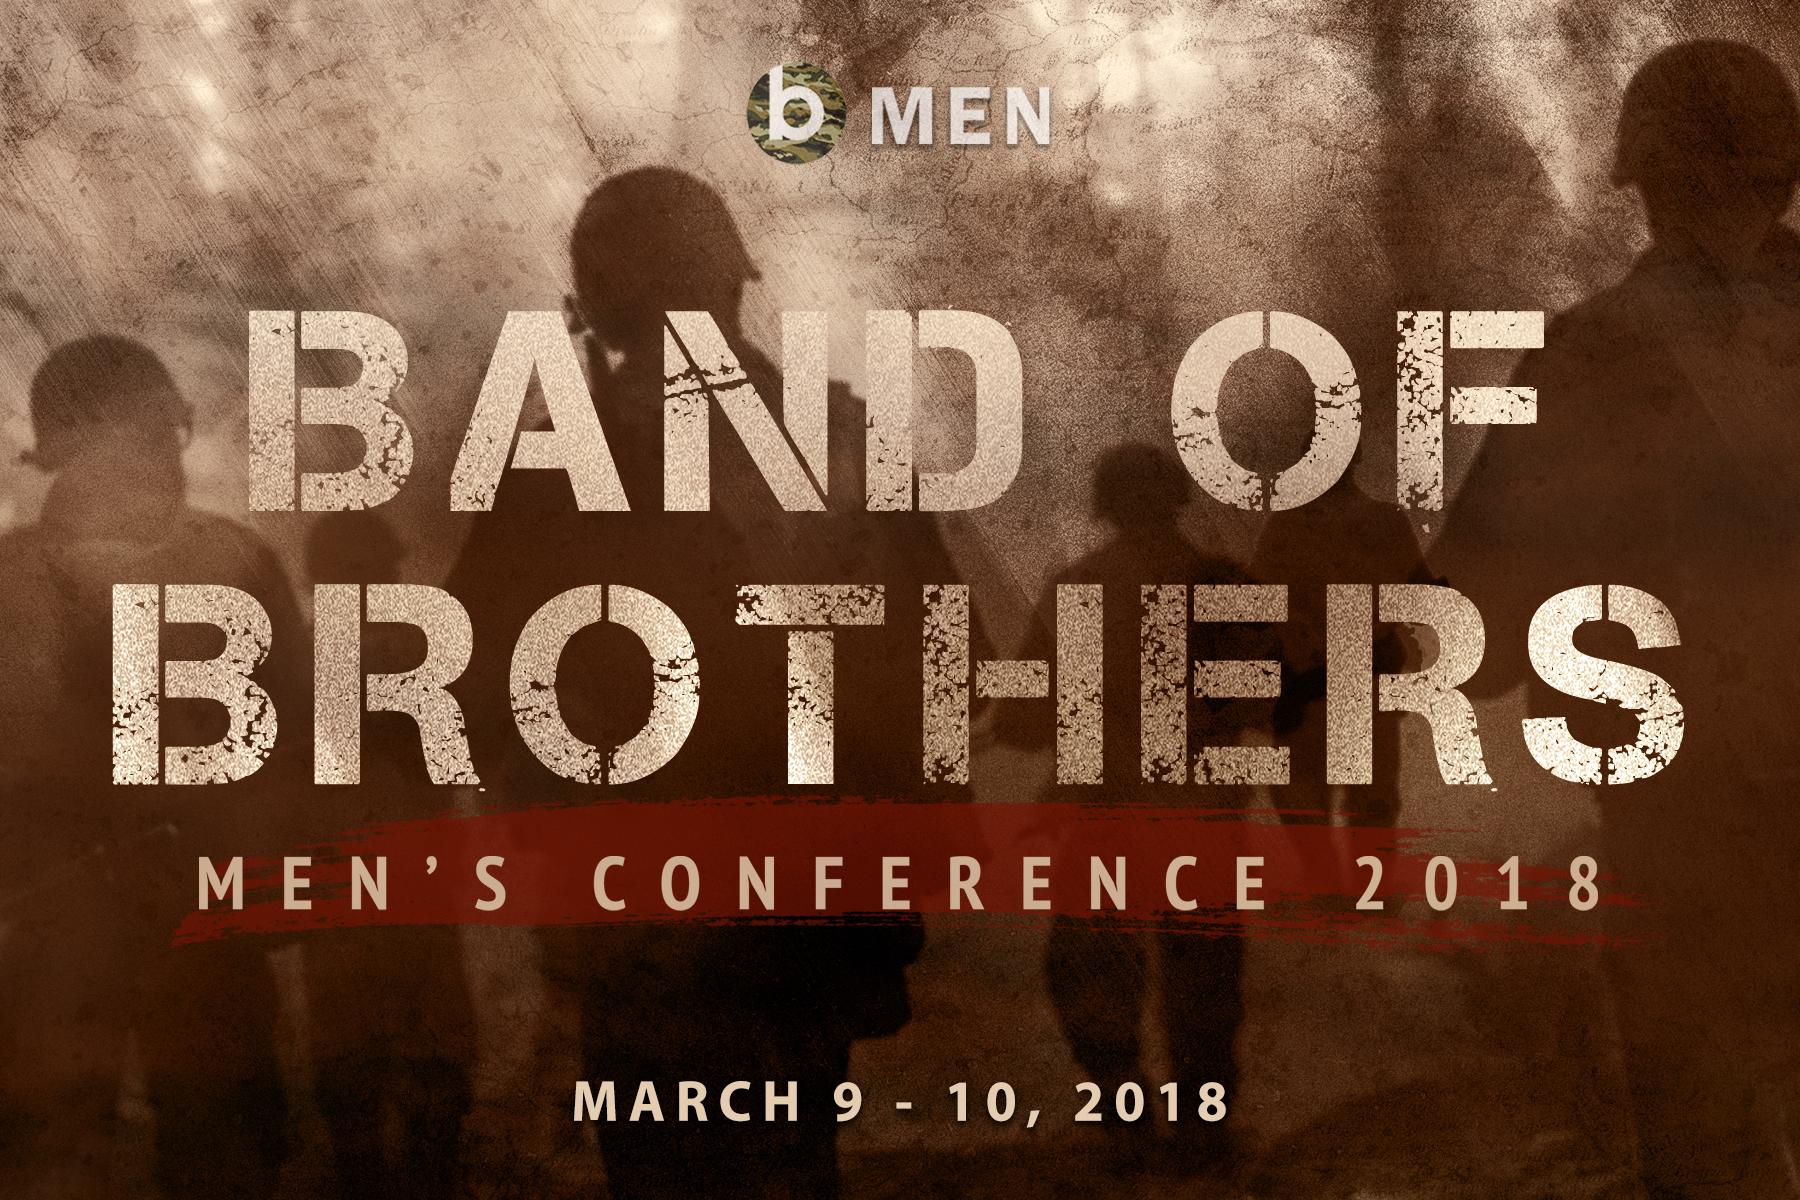 Men s conference invite card front